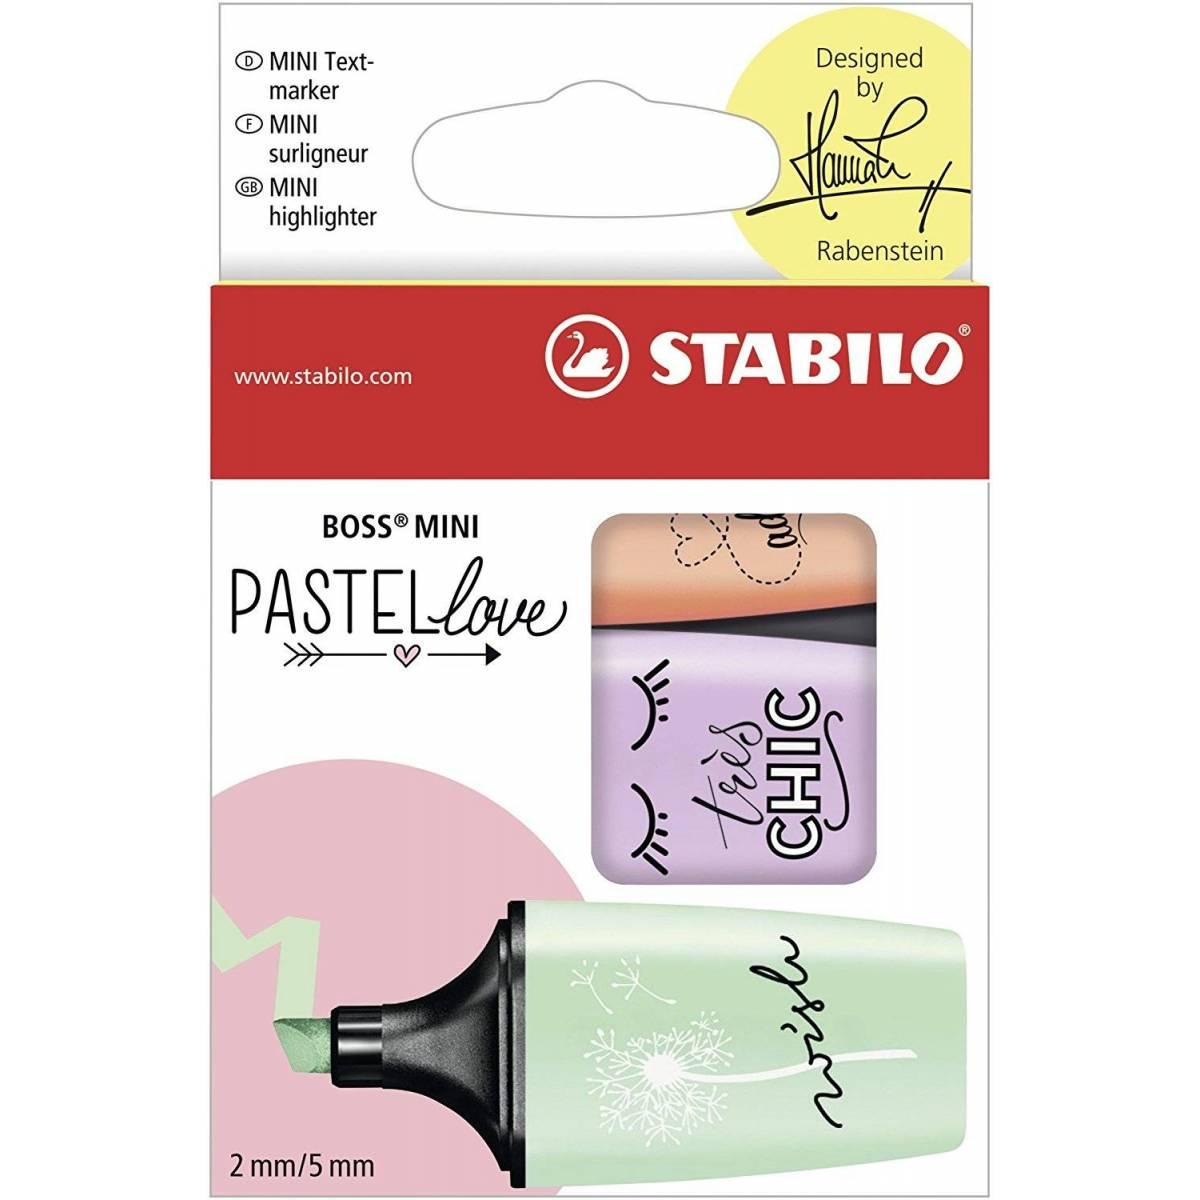 STABILO BOSS MINI - Lot de 3 Mini Surligneurs - Pastel Love